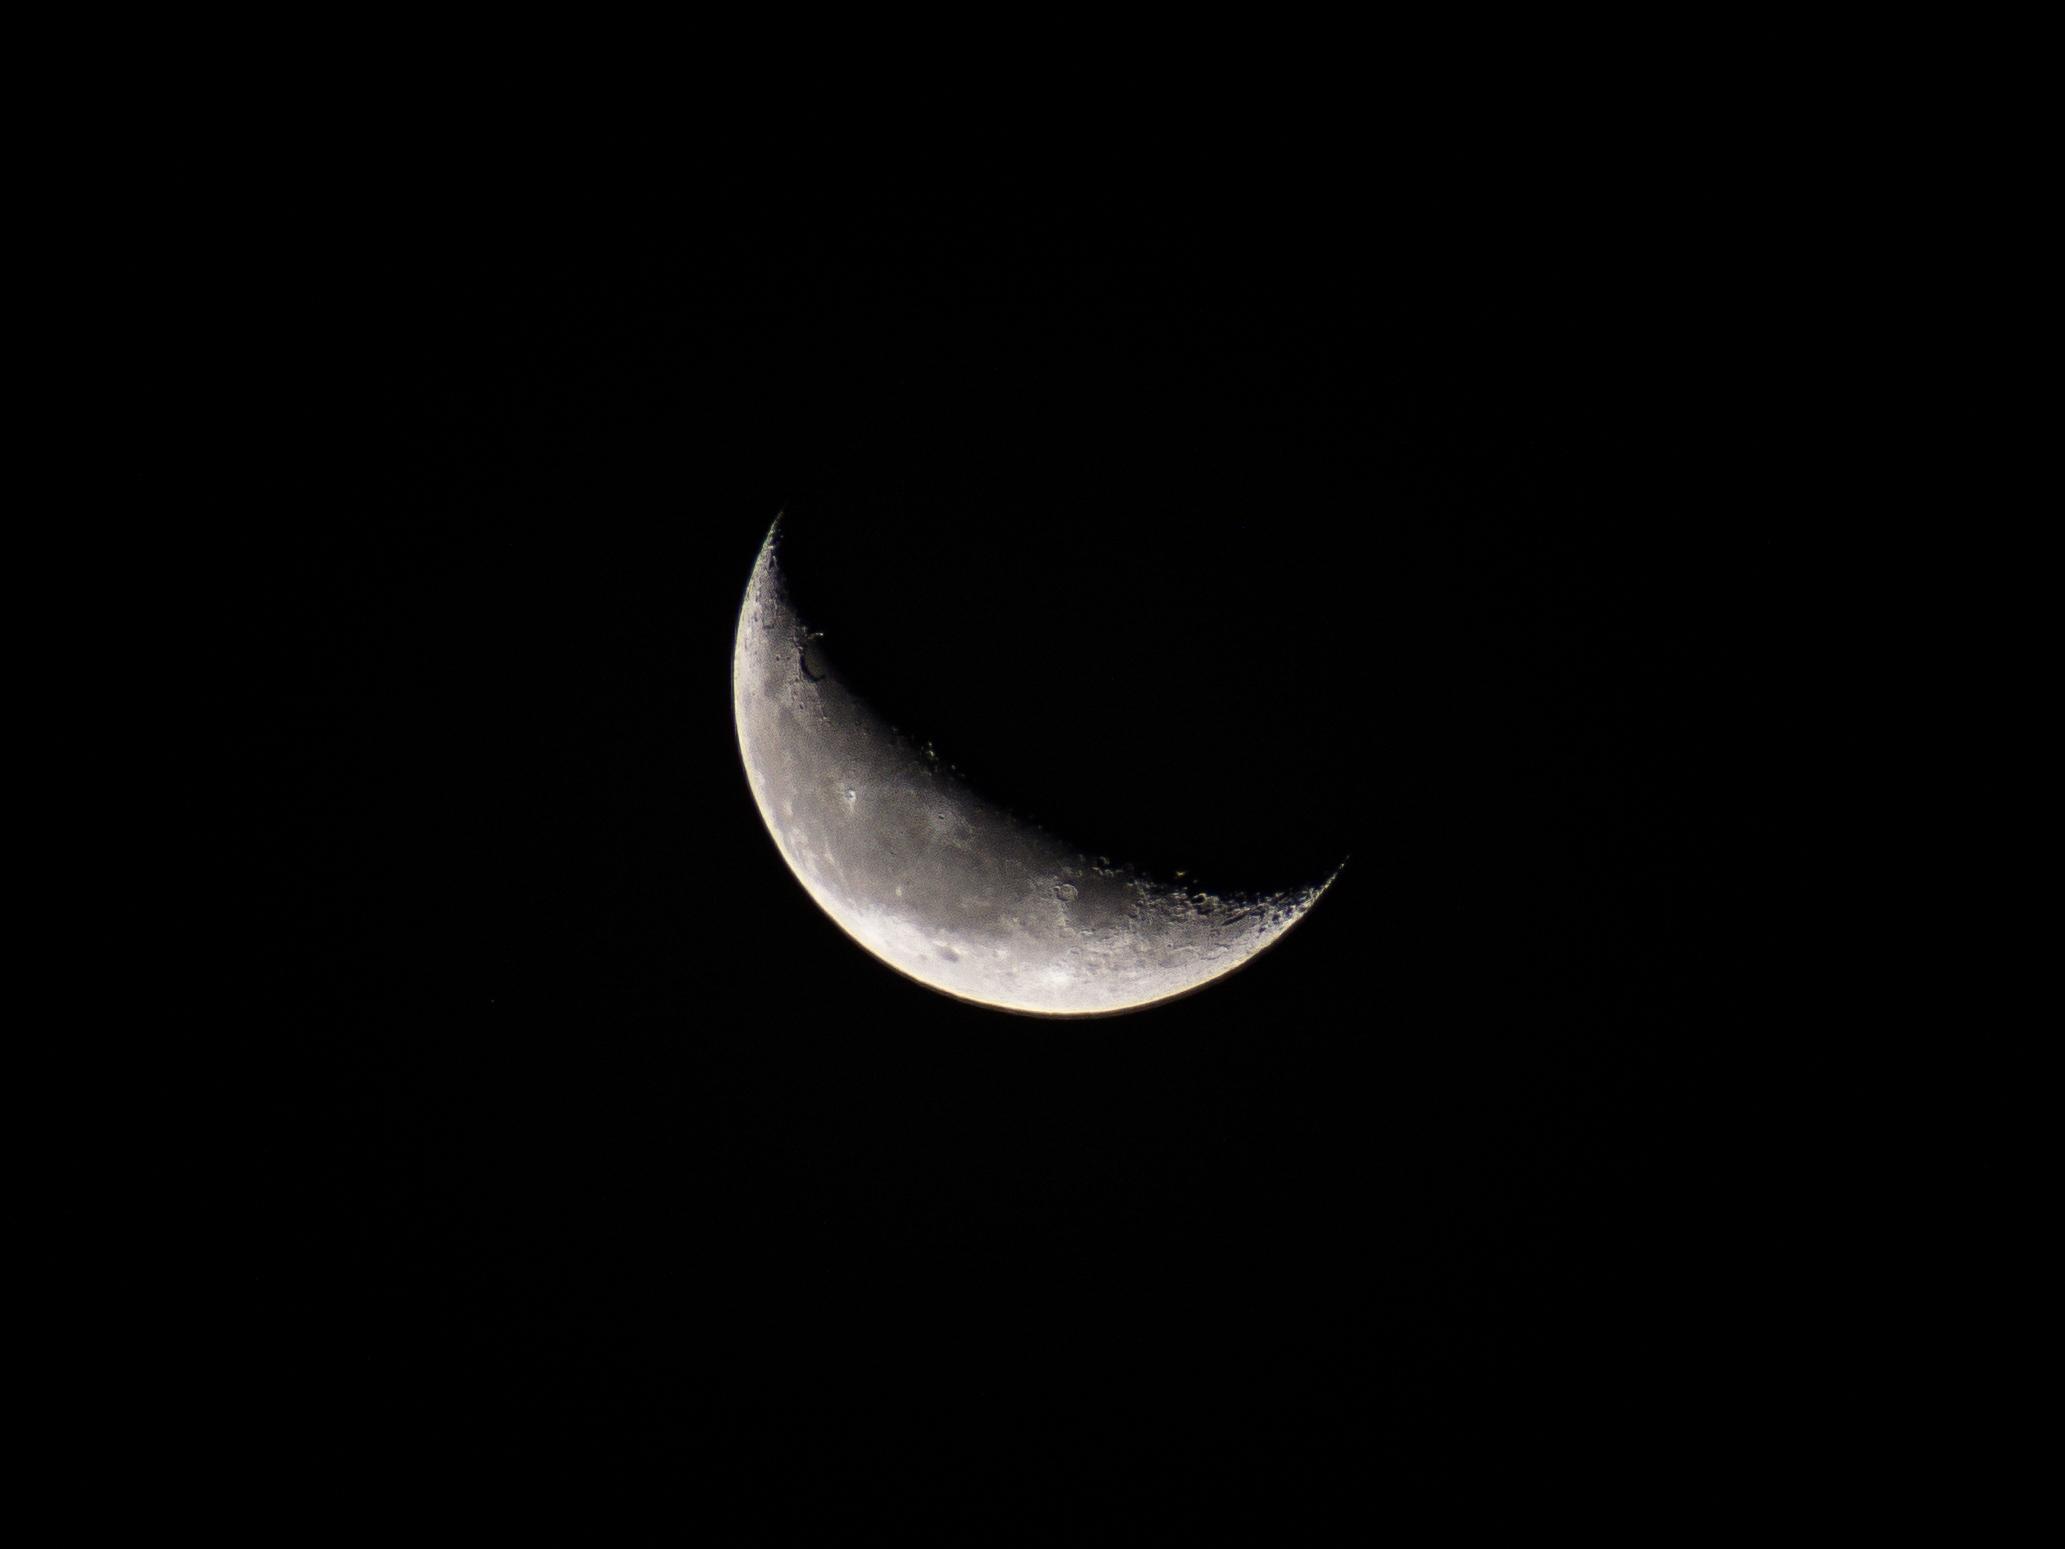 Crescent Moon on Black Background